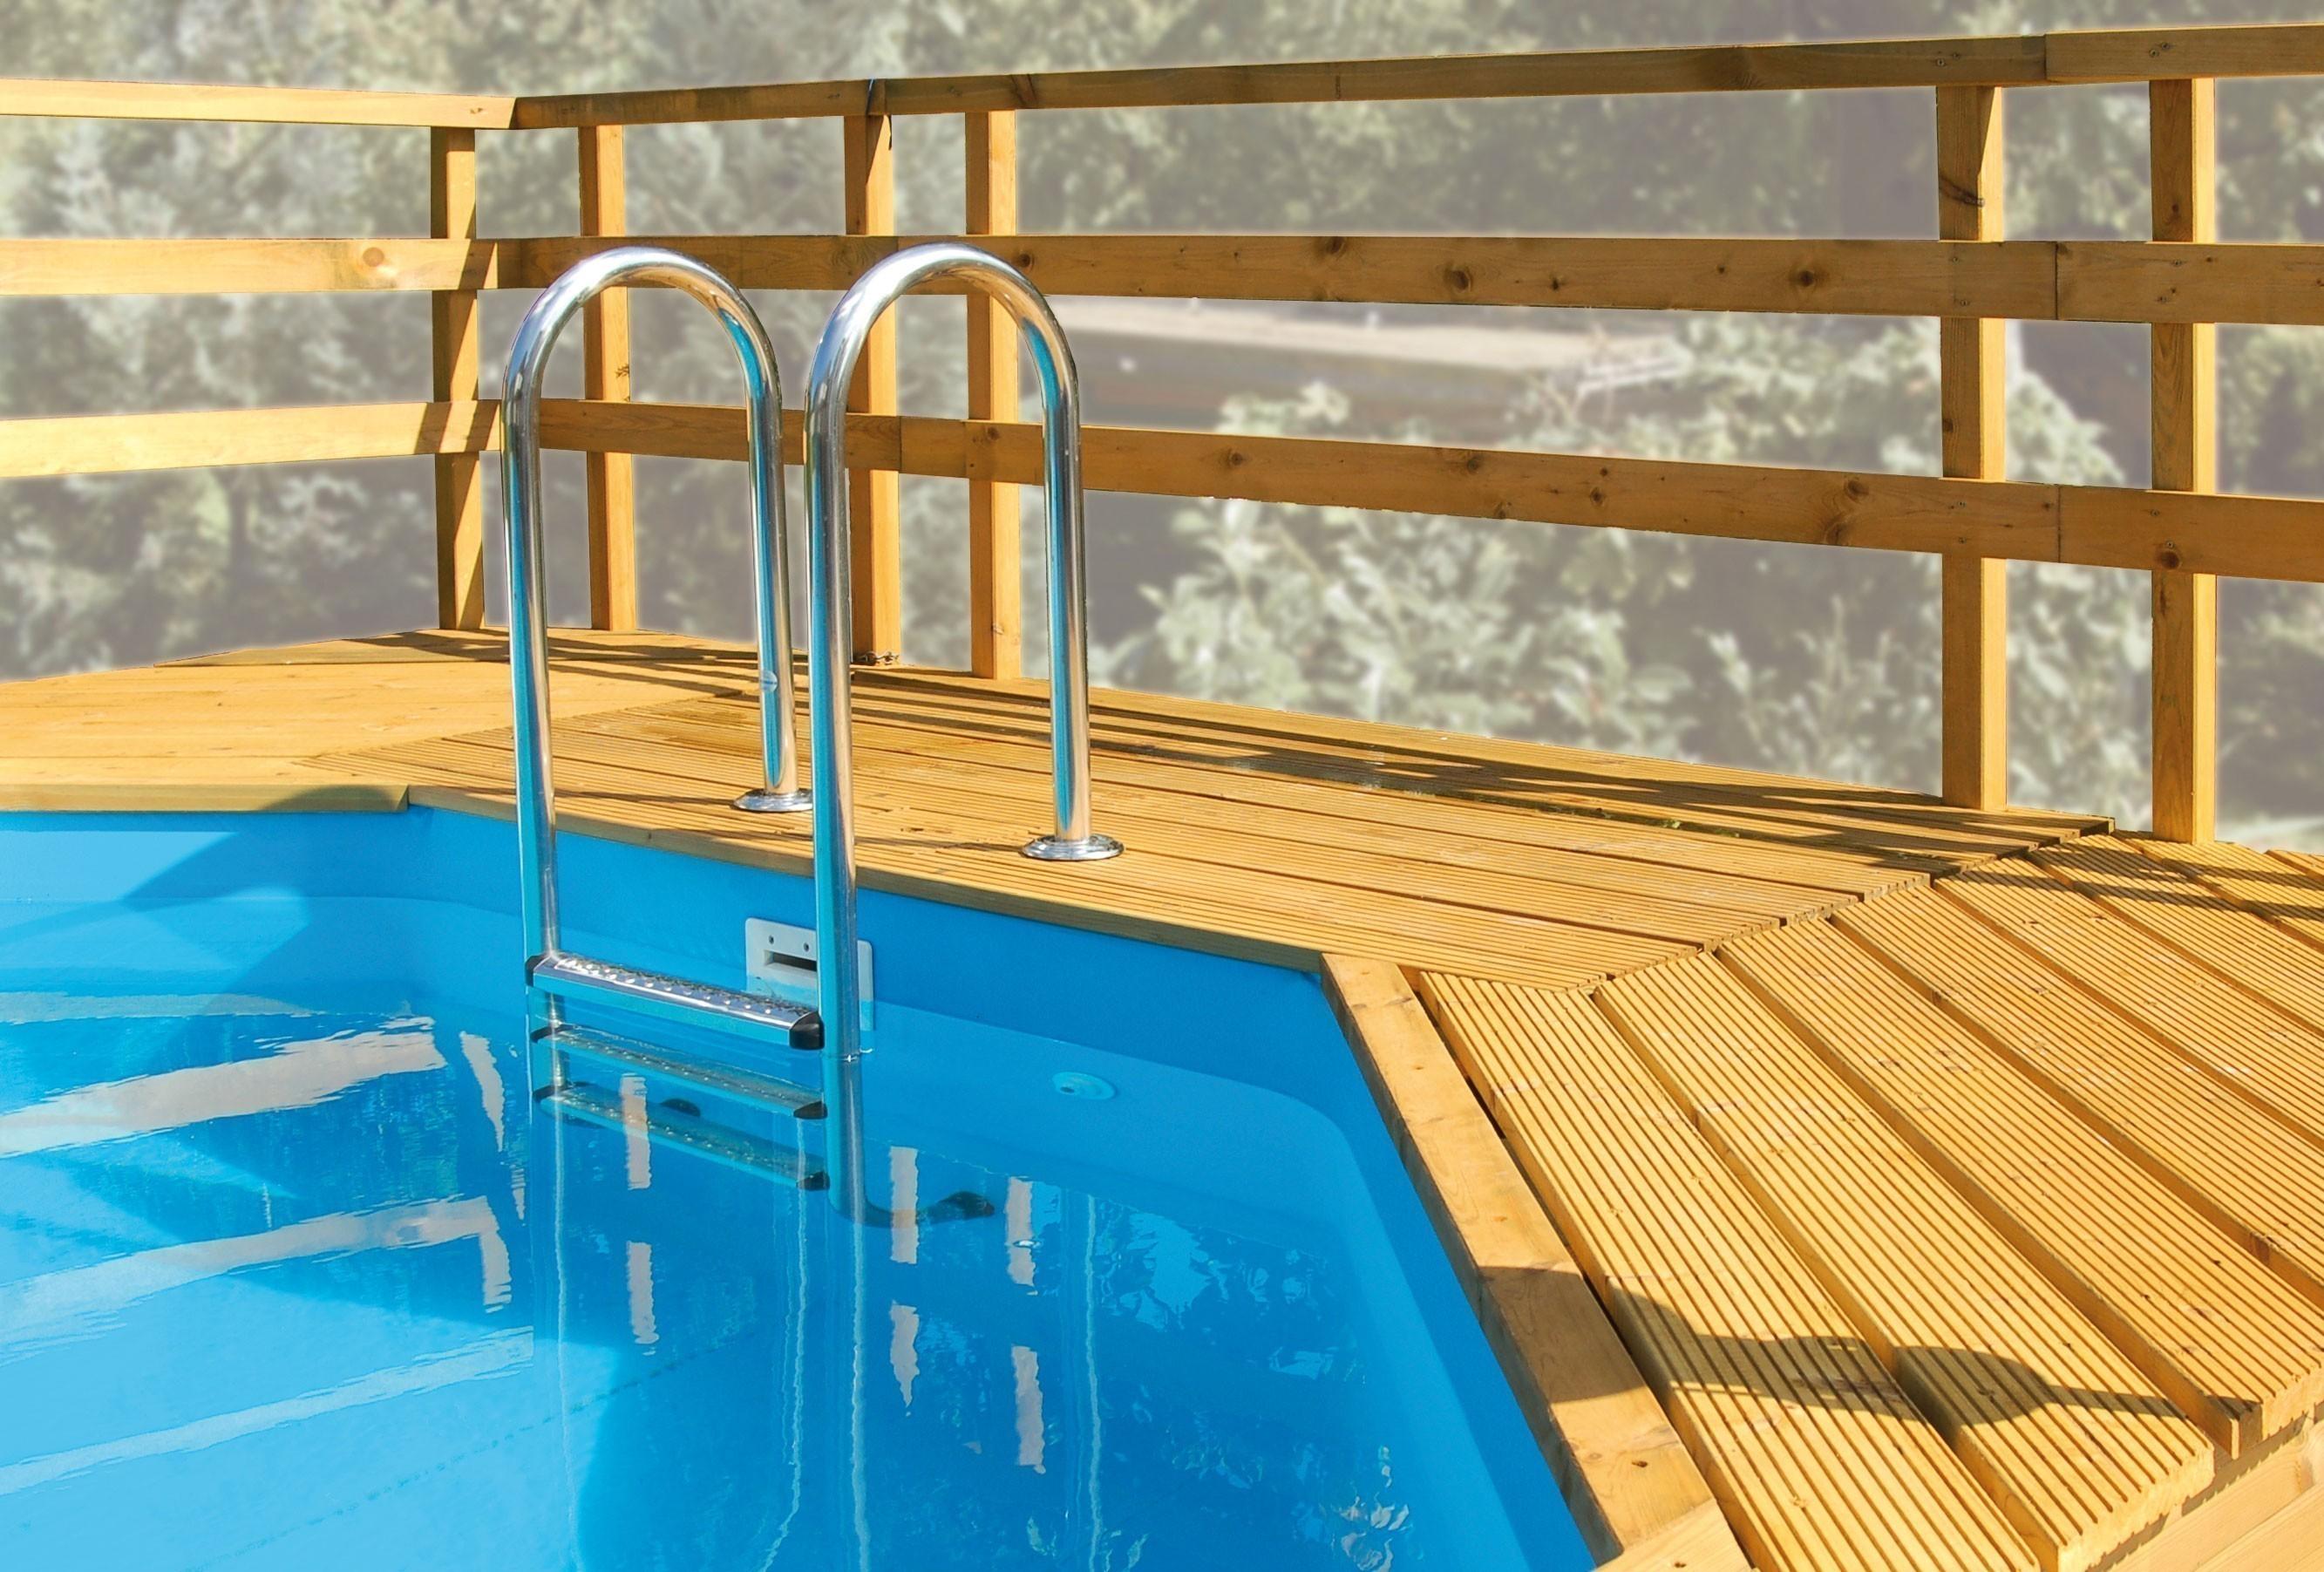 sonnendeck f r weka pool modell korsika korfu und malta bei. Black Bedroom Furniture Sets. Home Design Ideas